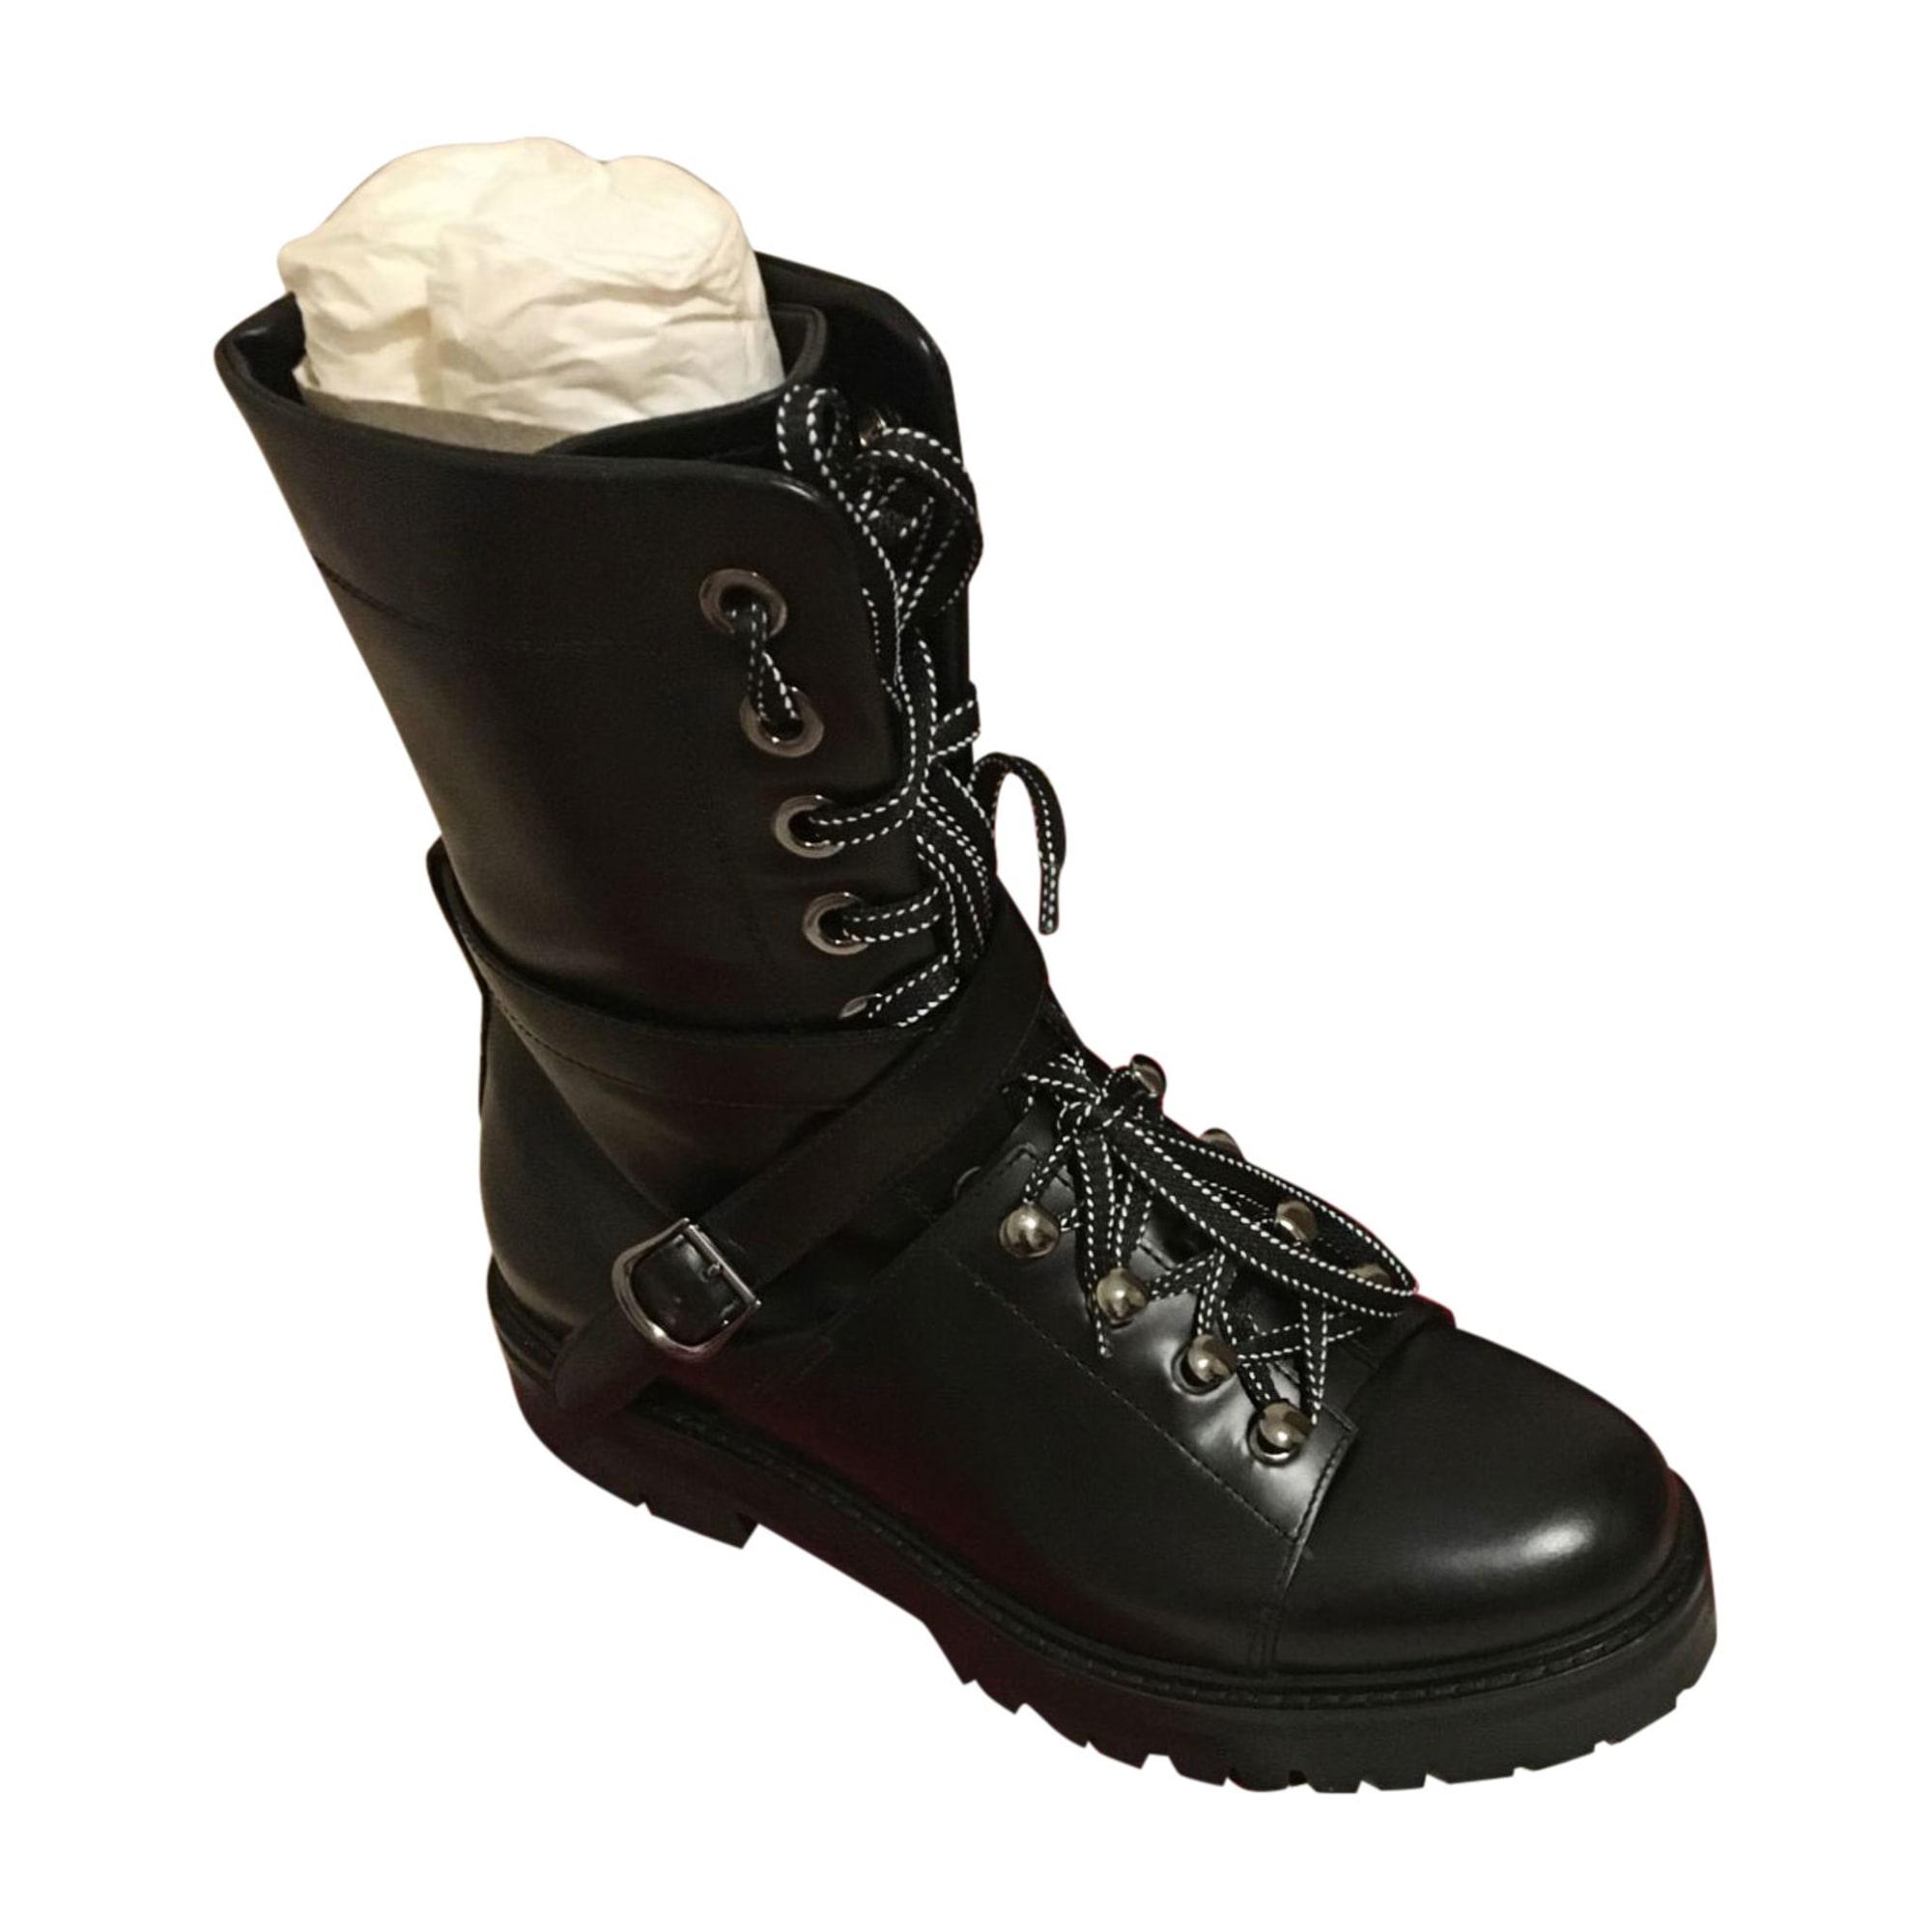 fe8c398e5dc92 Flat Ankle Boots VALENTINO rockstud 38 black - 7977700